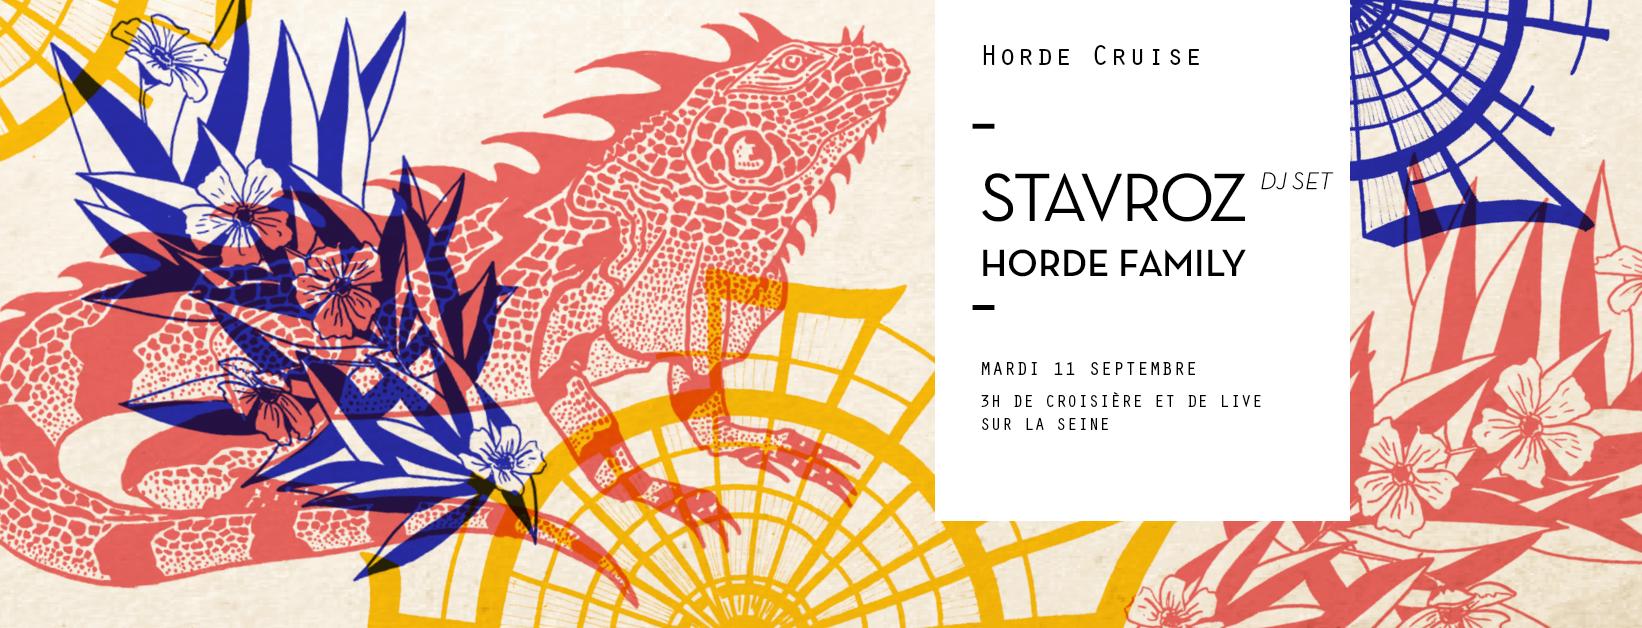 Horde Cruise S2EP08 : Stavroz